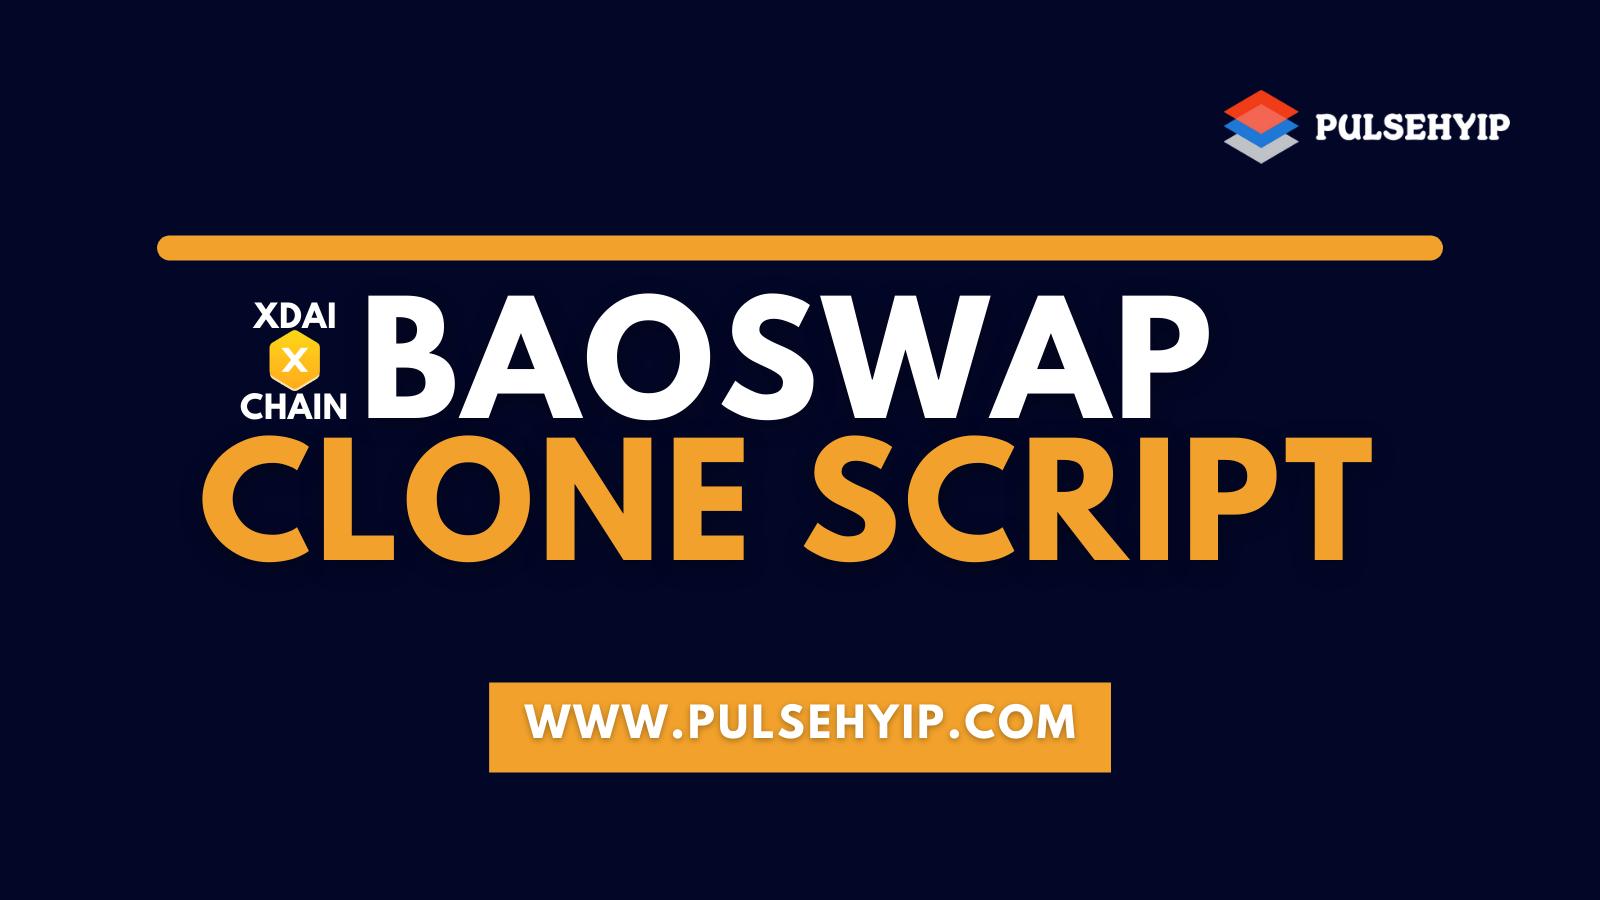 Baoswap Clone Script to Begin a Decentralized Exchange like Baoswap on XDai Chain